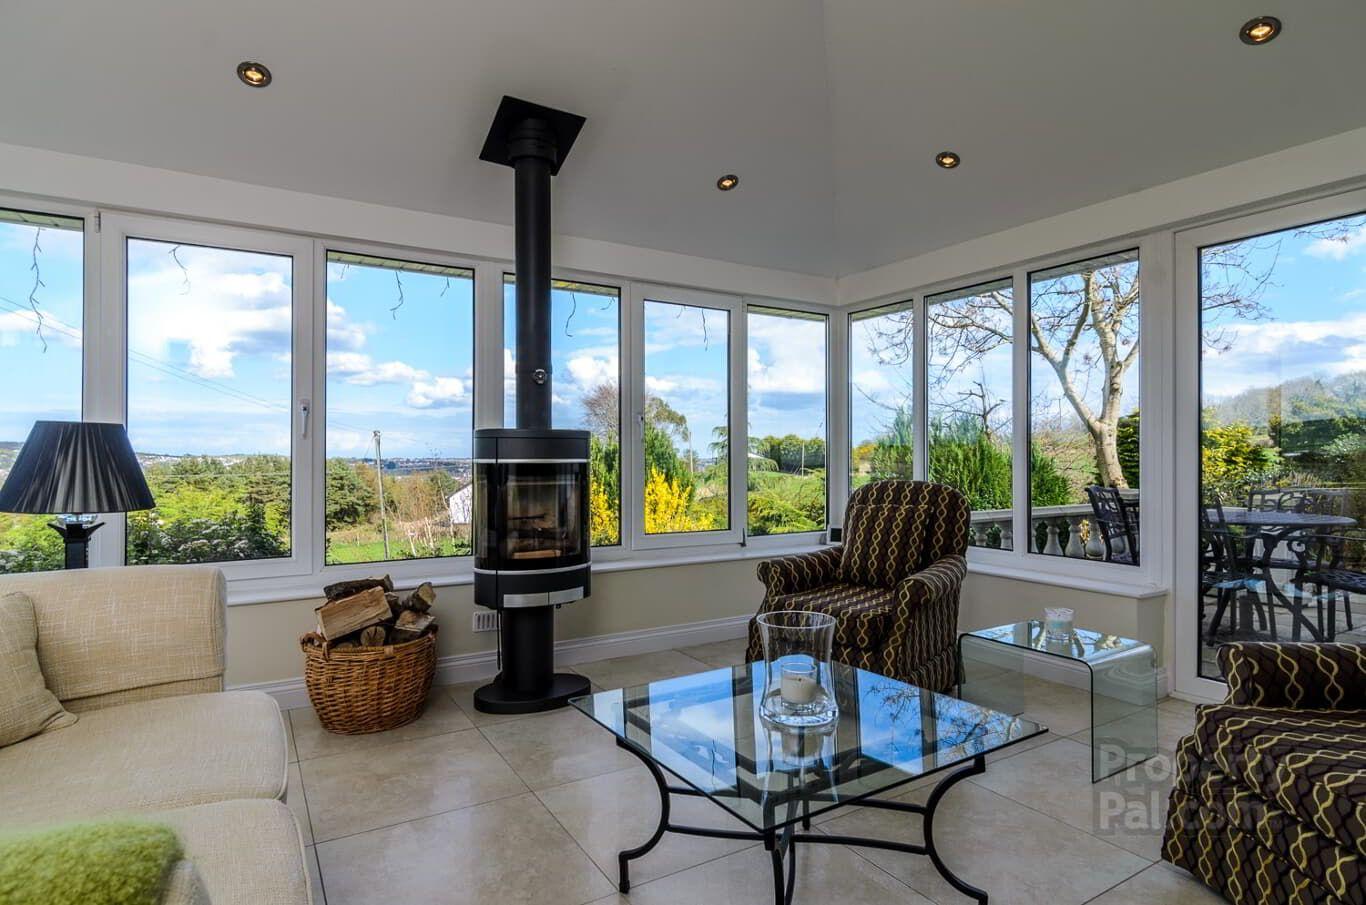 4 Road, Newtownards sunroom conservatory